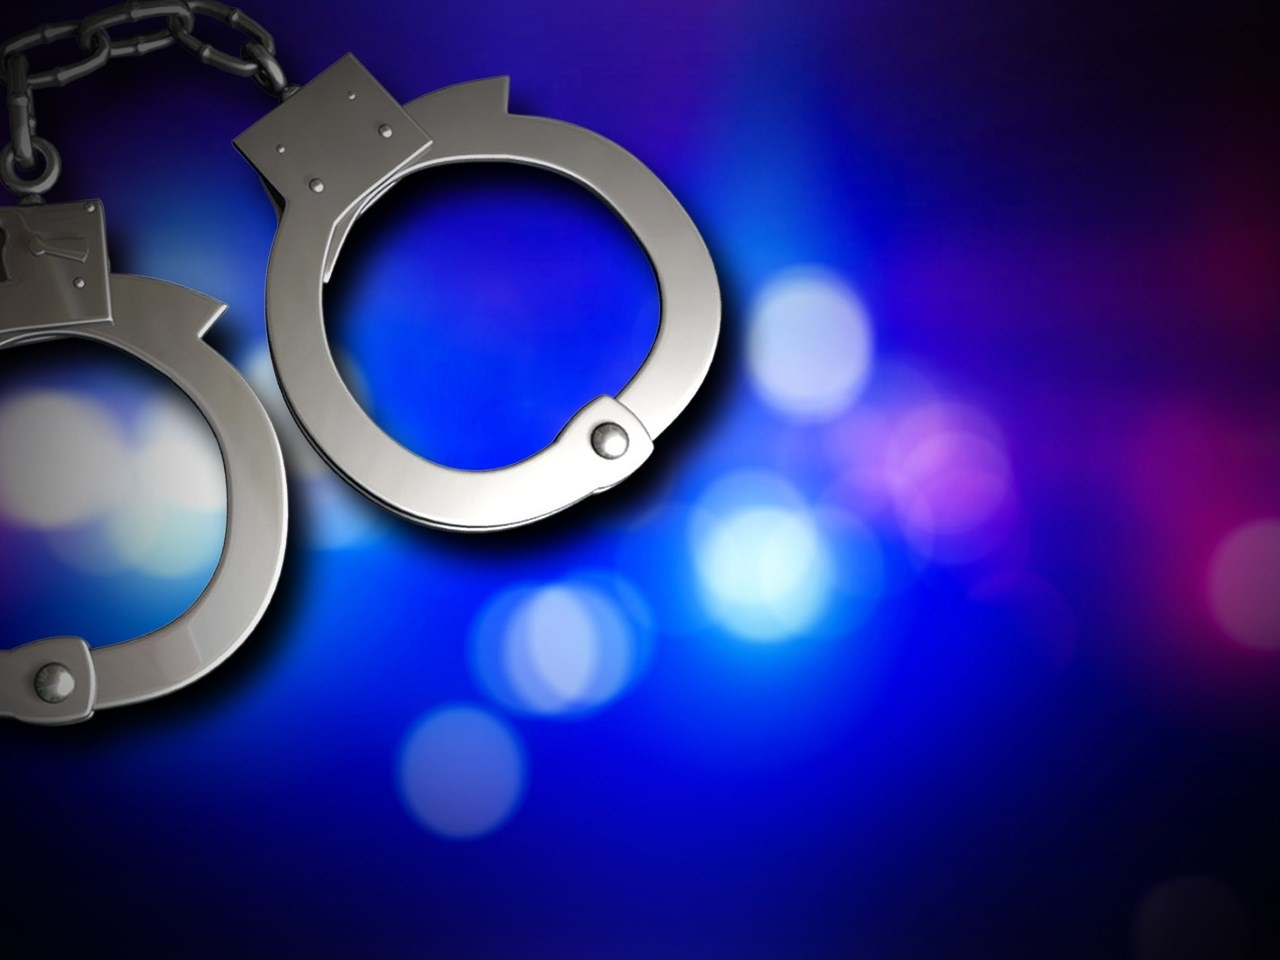 handcuffs_1466712919344-118809306-118809306.jpg